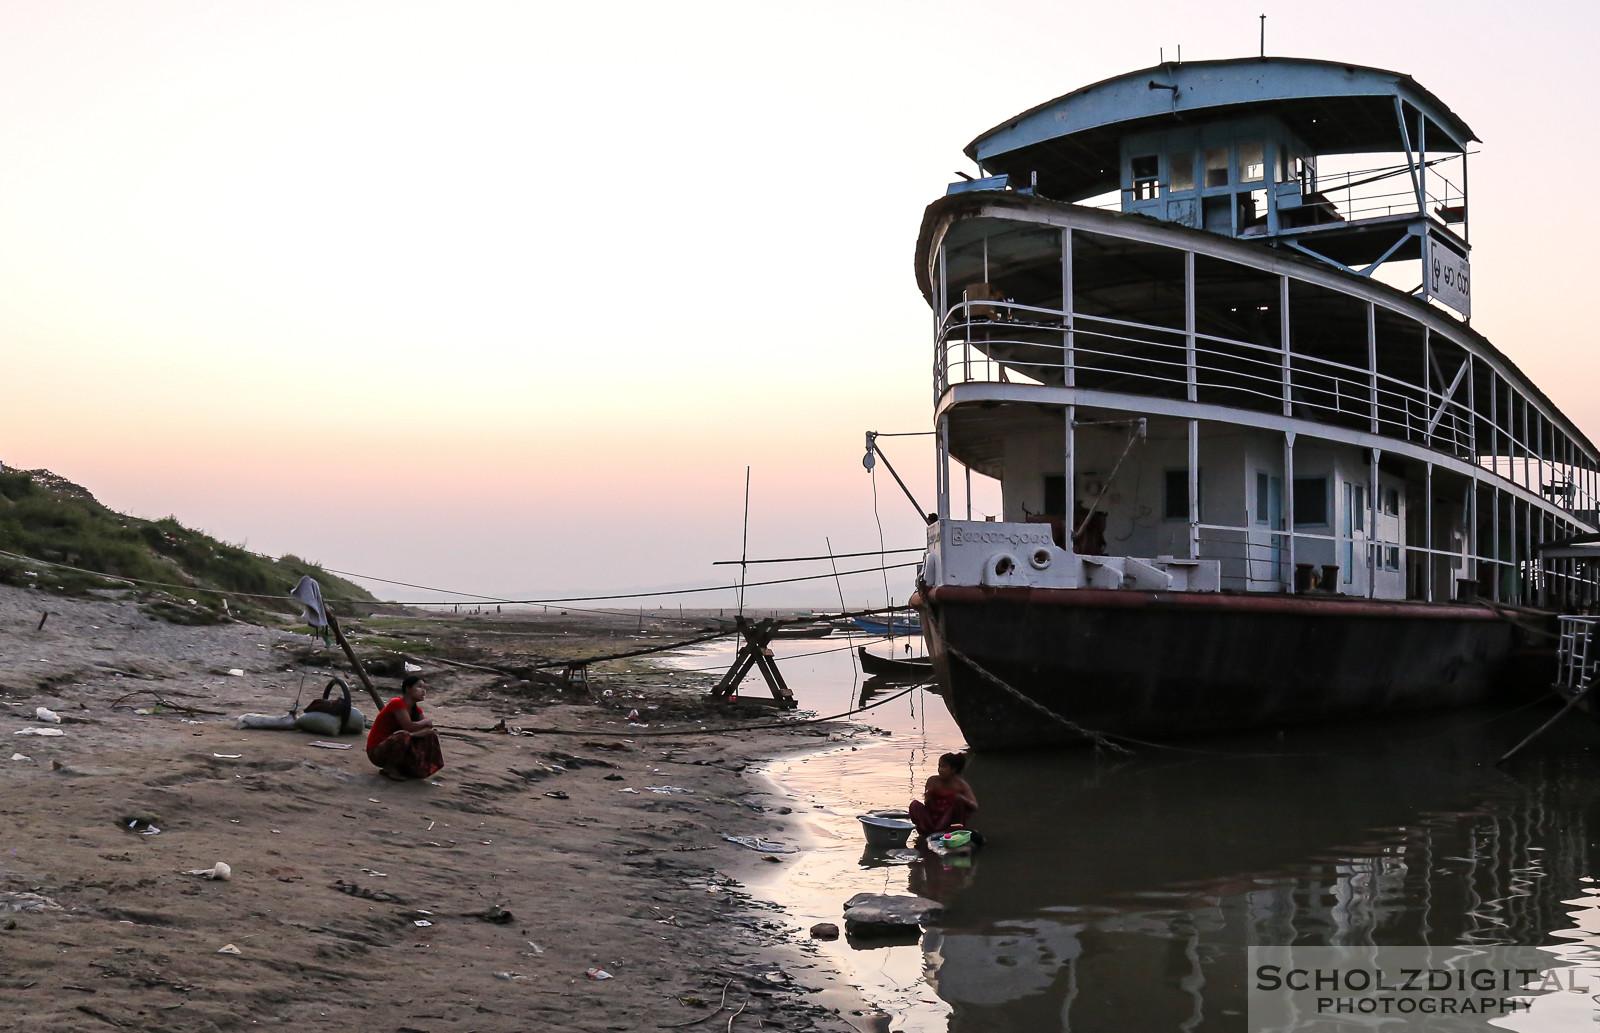 Asia, Ayeyarwady, Bagan, Birma, Burma, Exploring, globetrotter, Irrawaddy, Mandala, Mandalay, Myanmar, Southeastasia, Streetphotography, travel, Travelling, travelphotography, Wanderlust